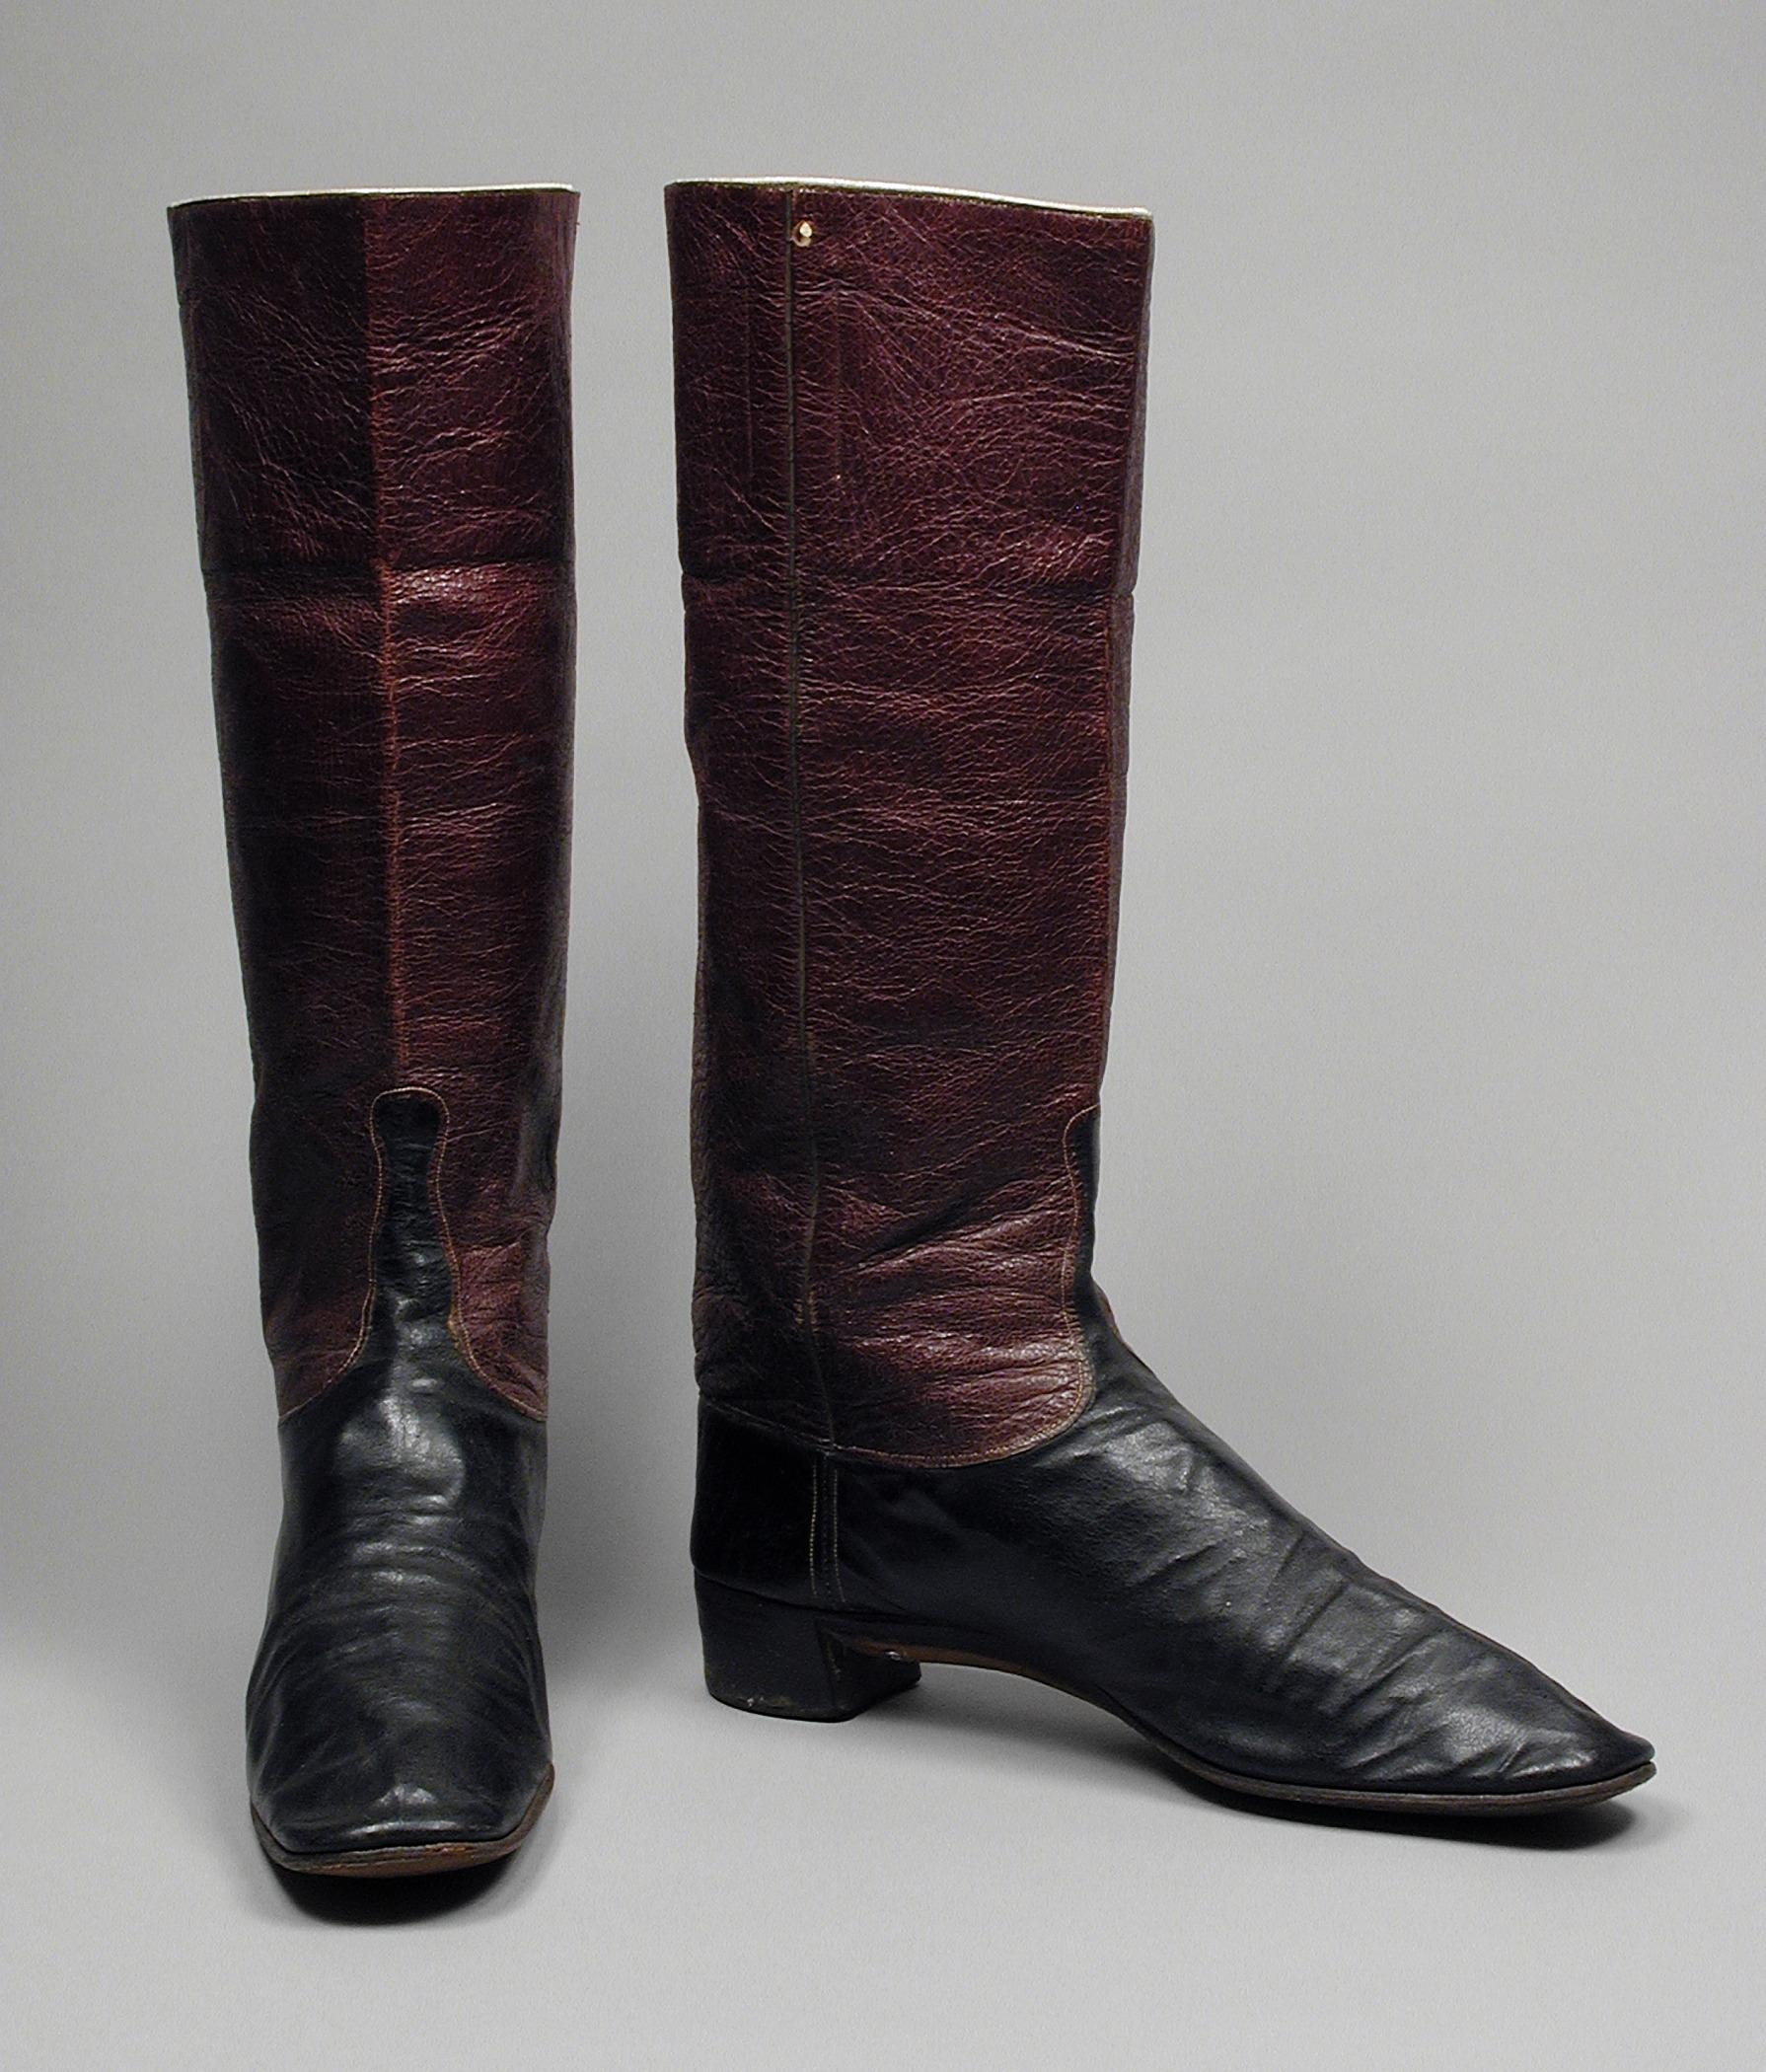 Wellington Boots: Benefits Of Having It